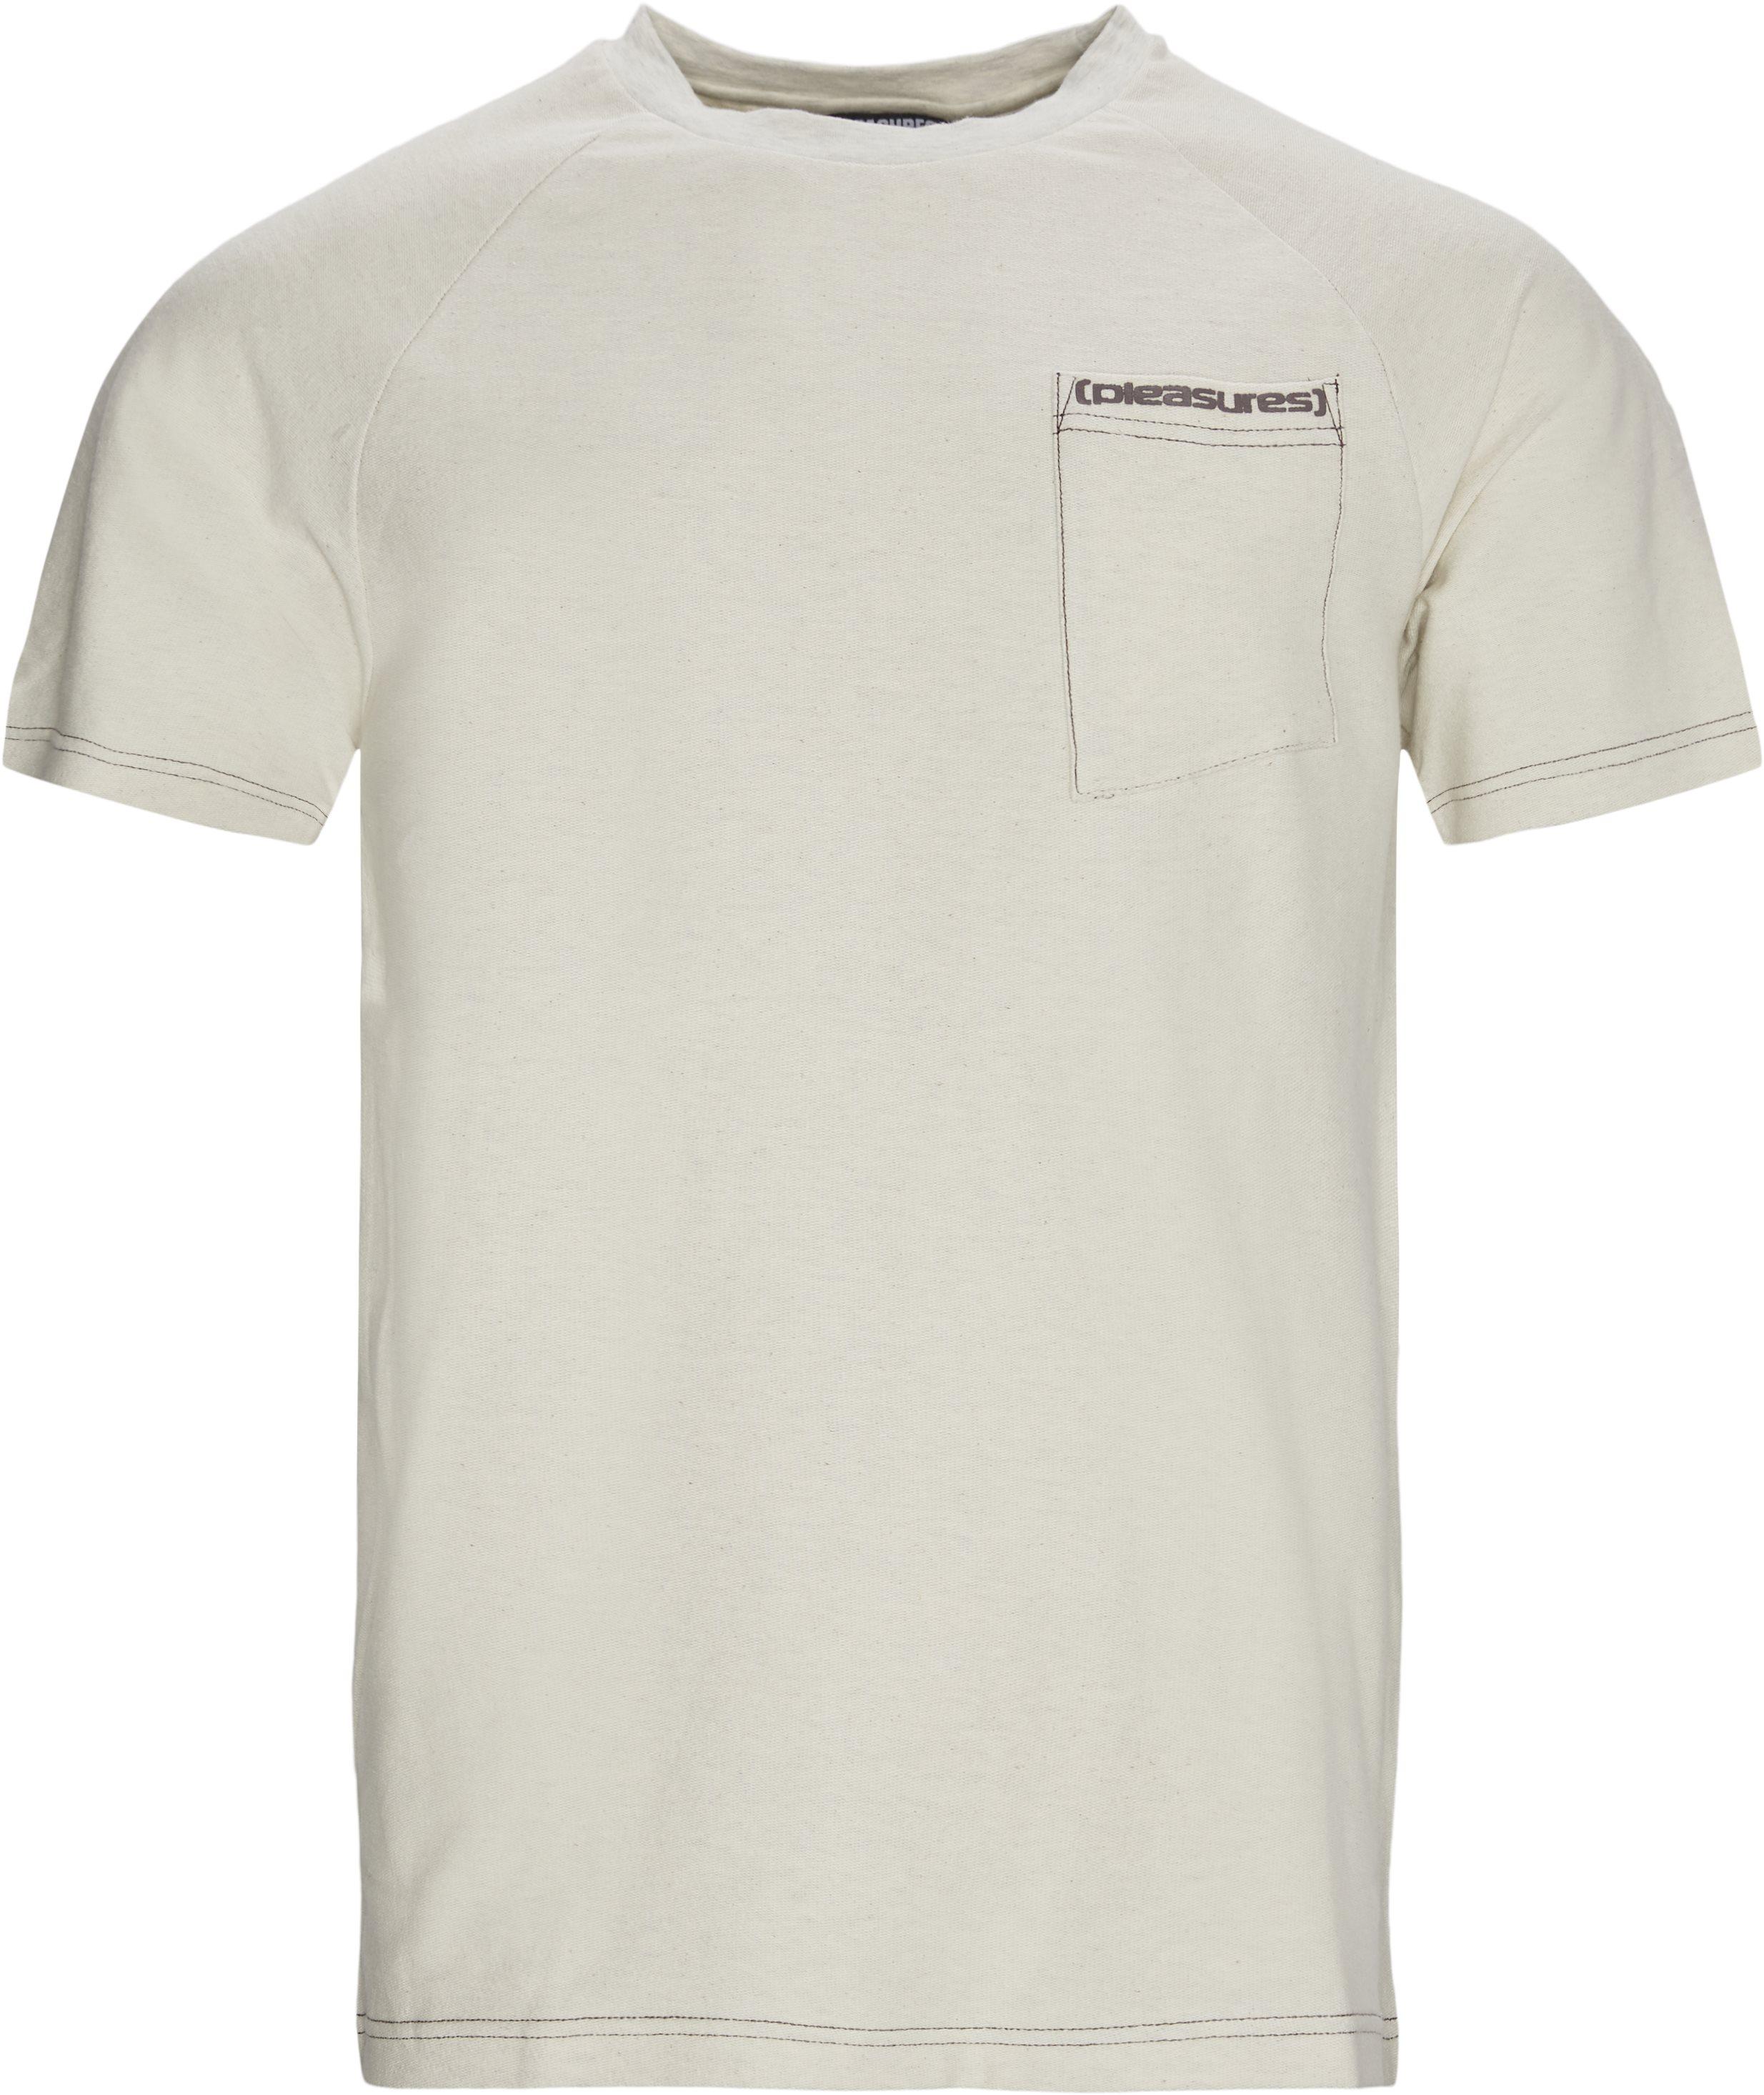 Vulgar Raglan Tee - T-shirts - Regular - Sand